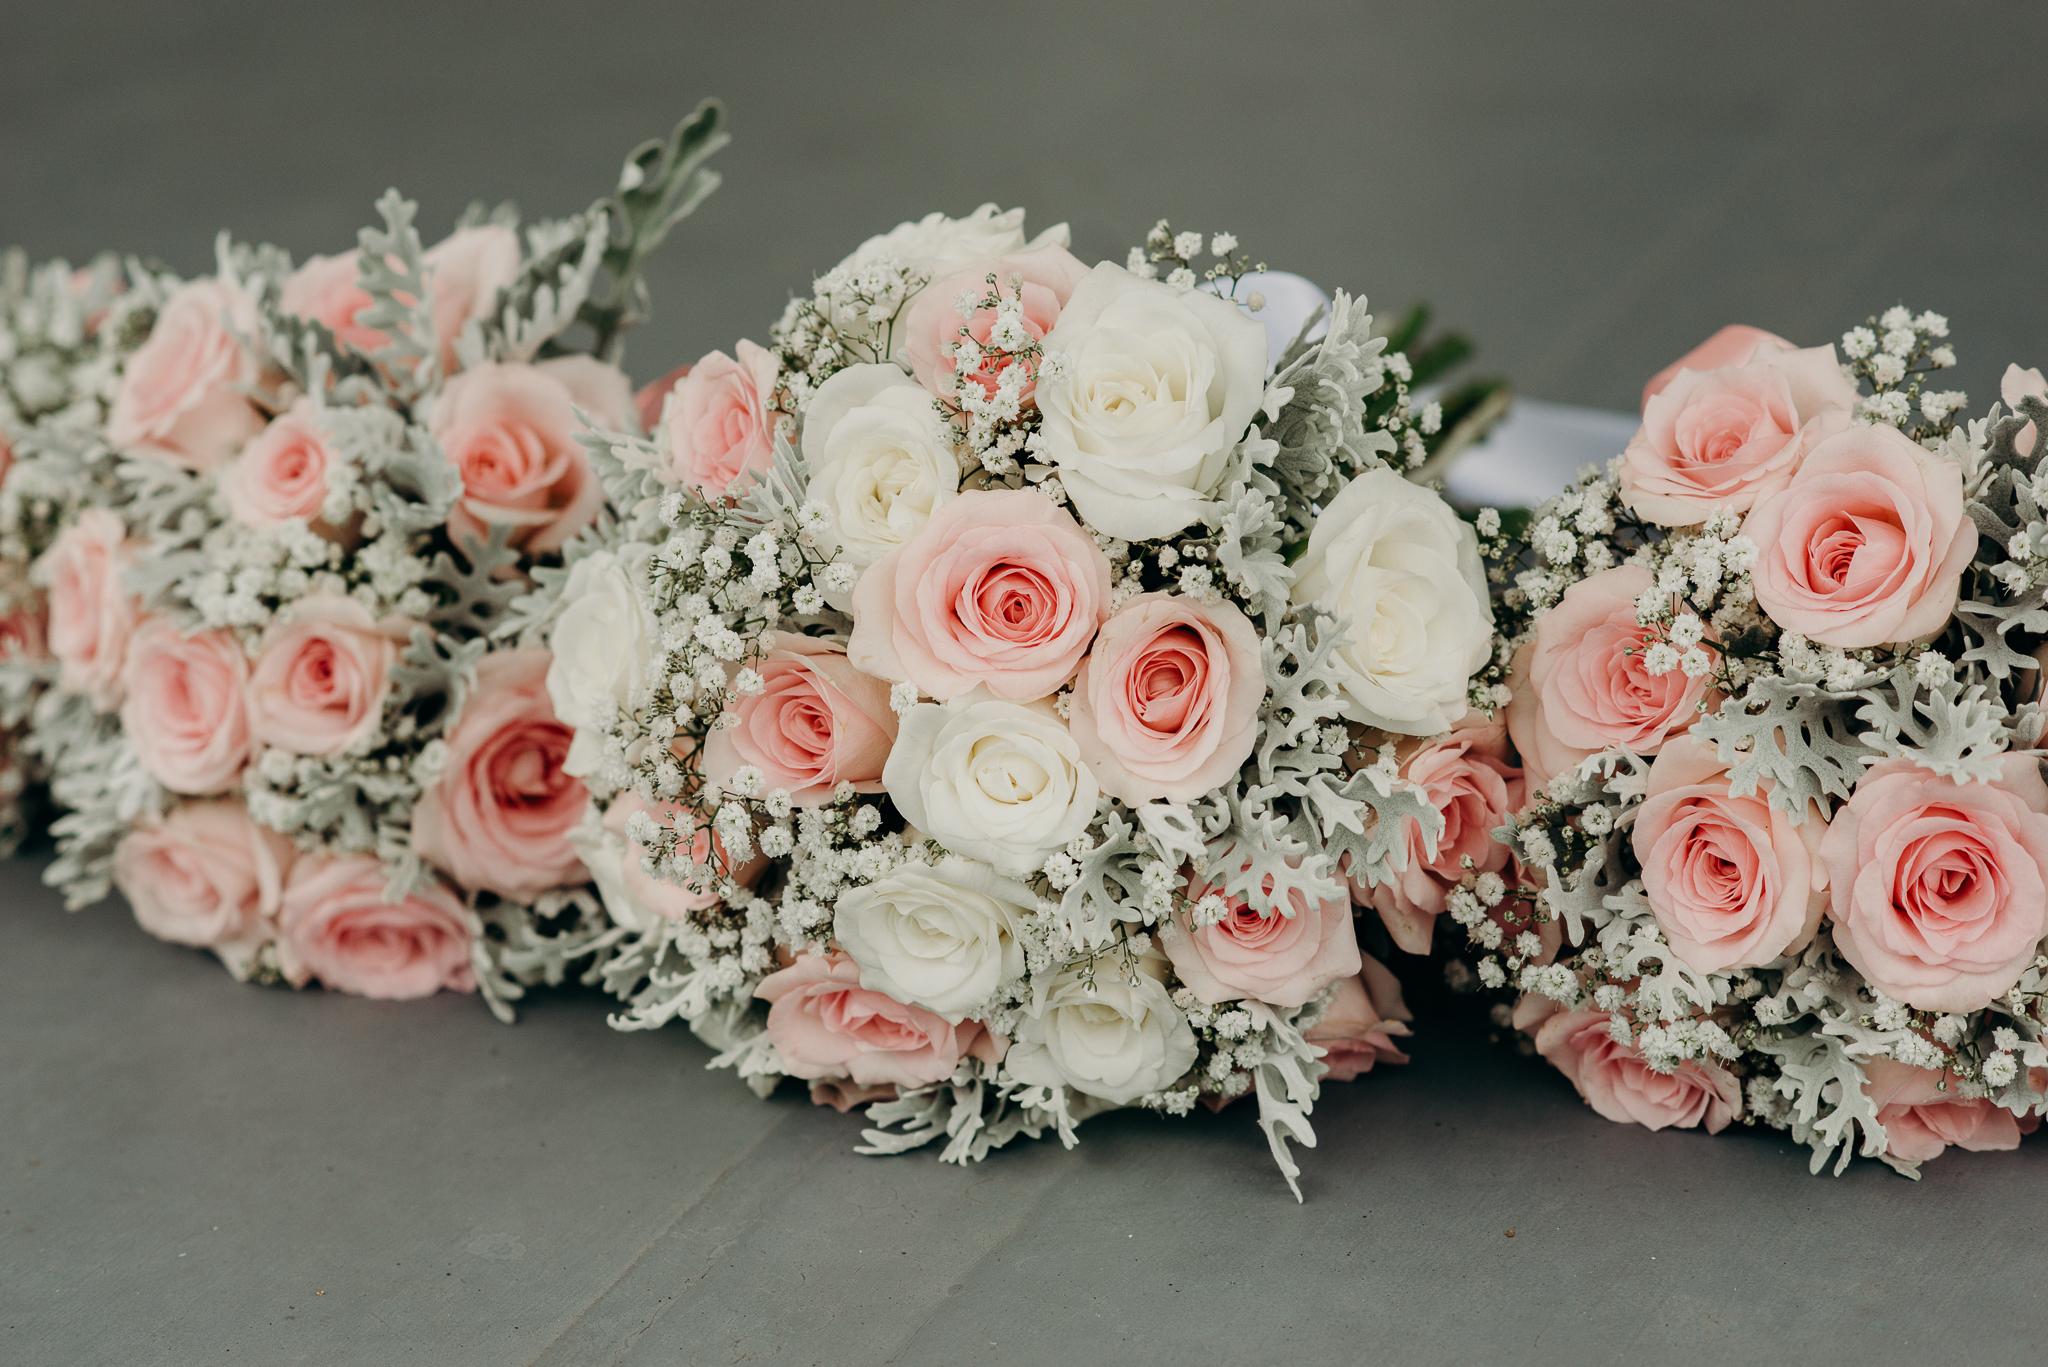 Tauranga-Coromandel-Elegant-Wedding-Photographer-Charlemagne-Lodge-15.jpg